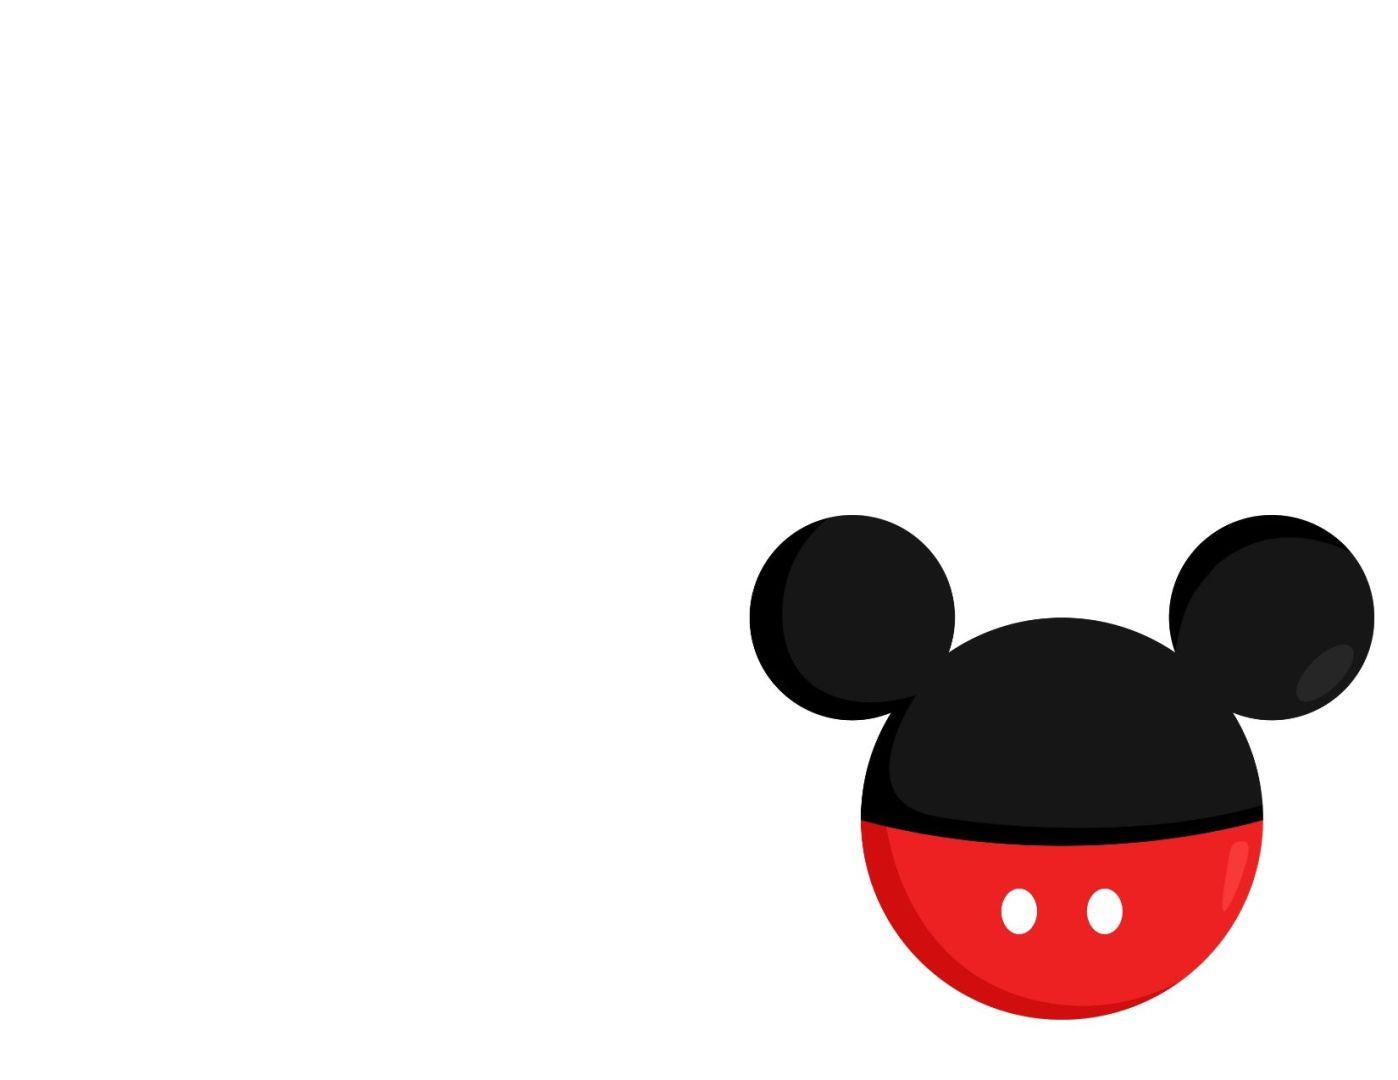 Mickey and Minnie autograph page | AlwaysMovingMommy.com